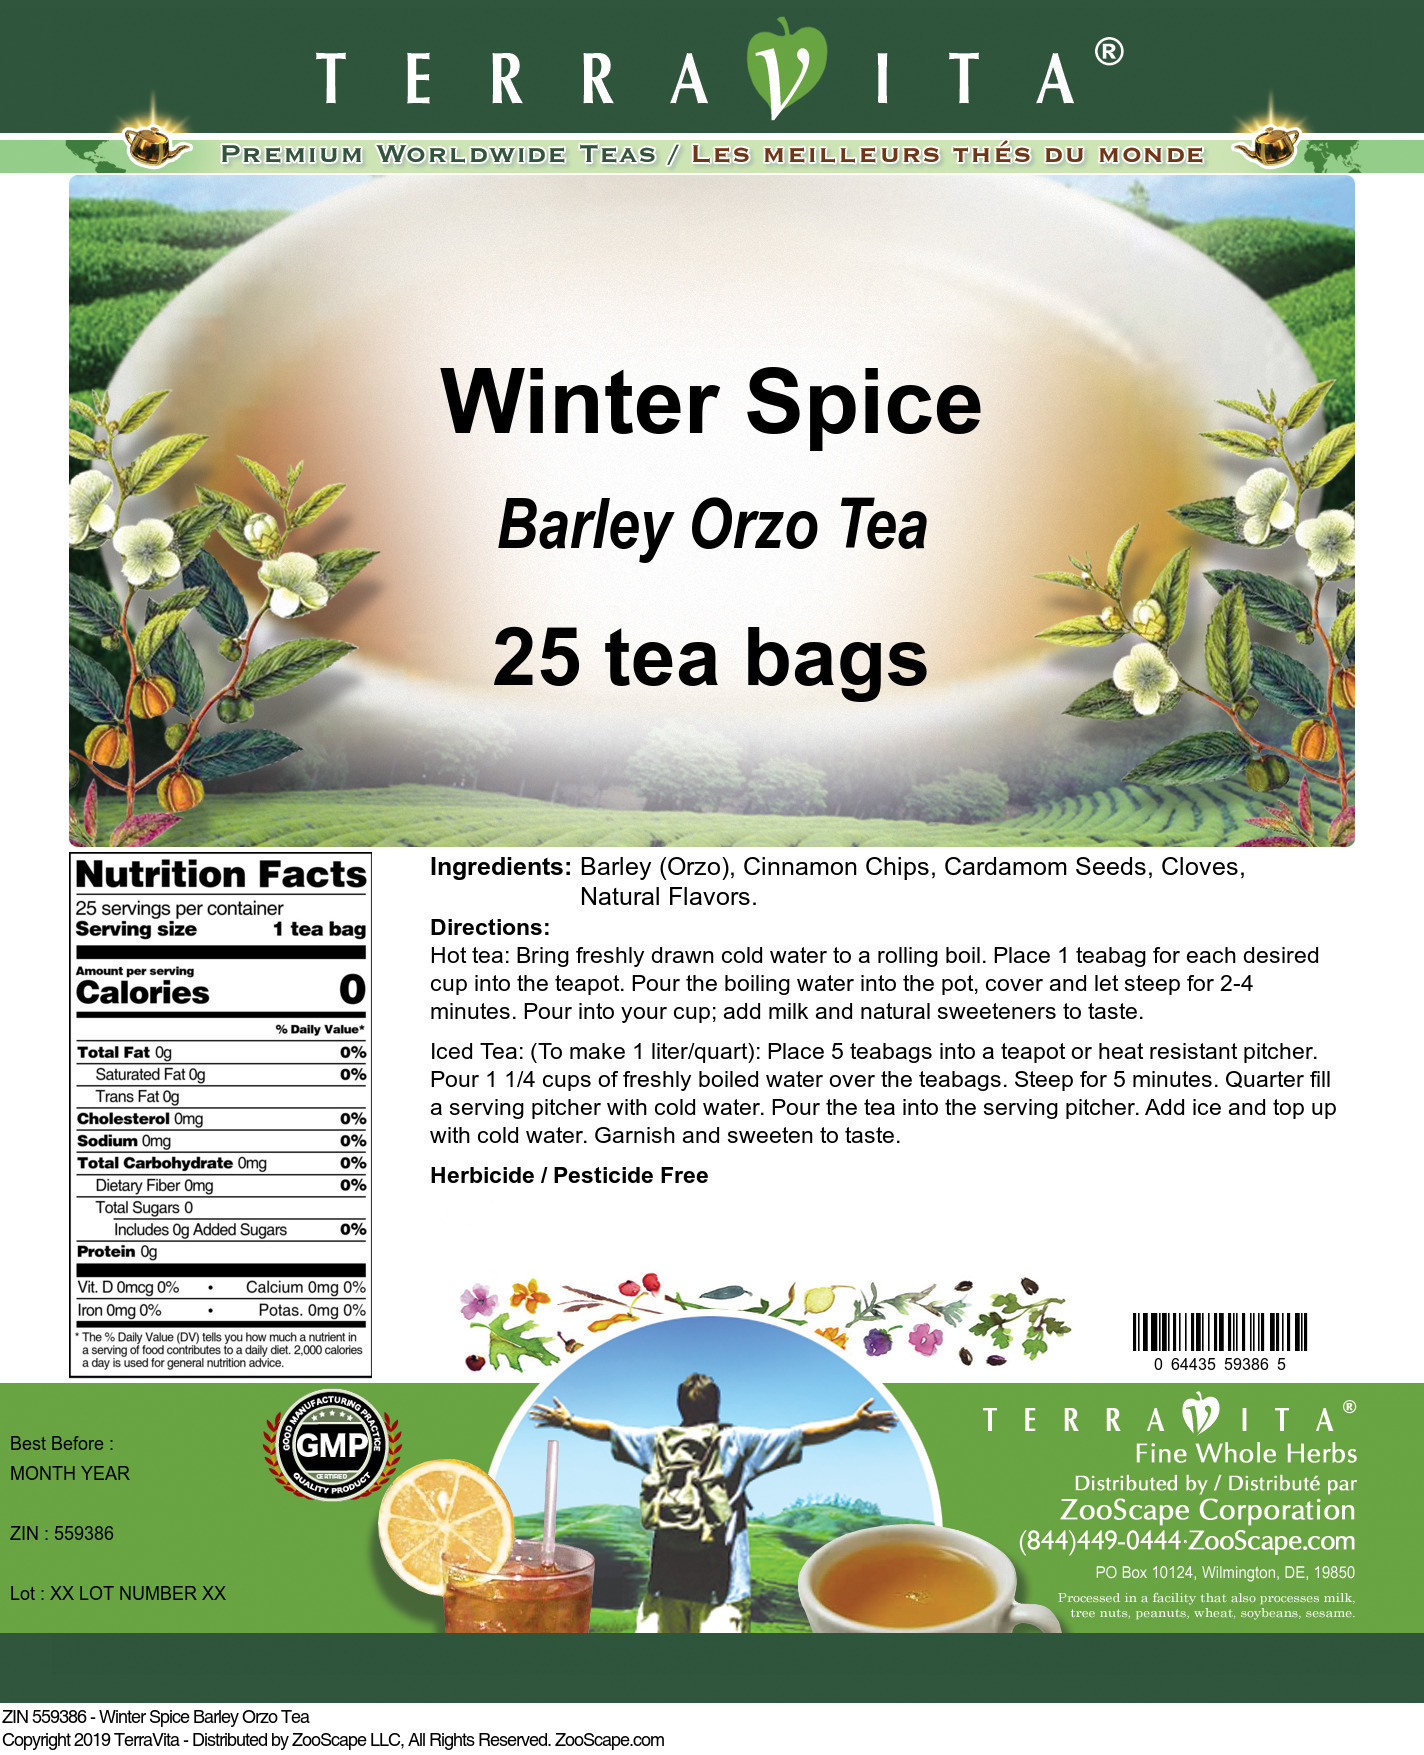 Winter Spice Barley Orzo